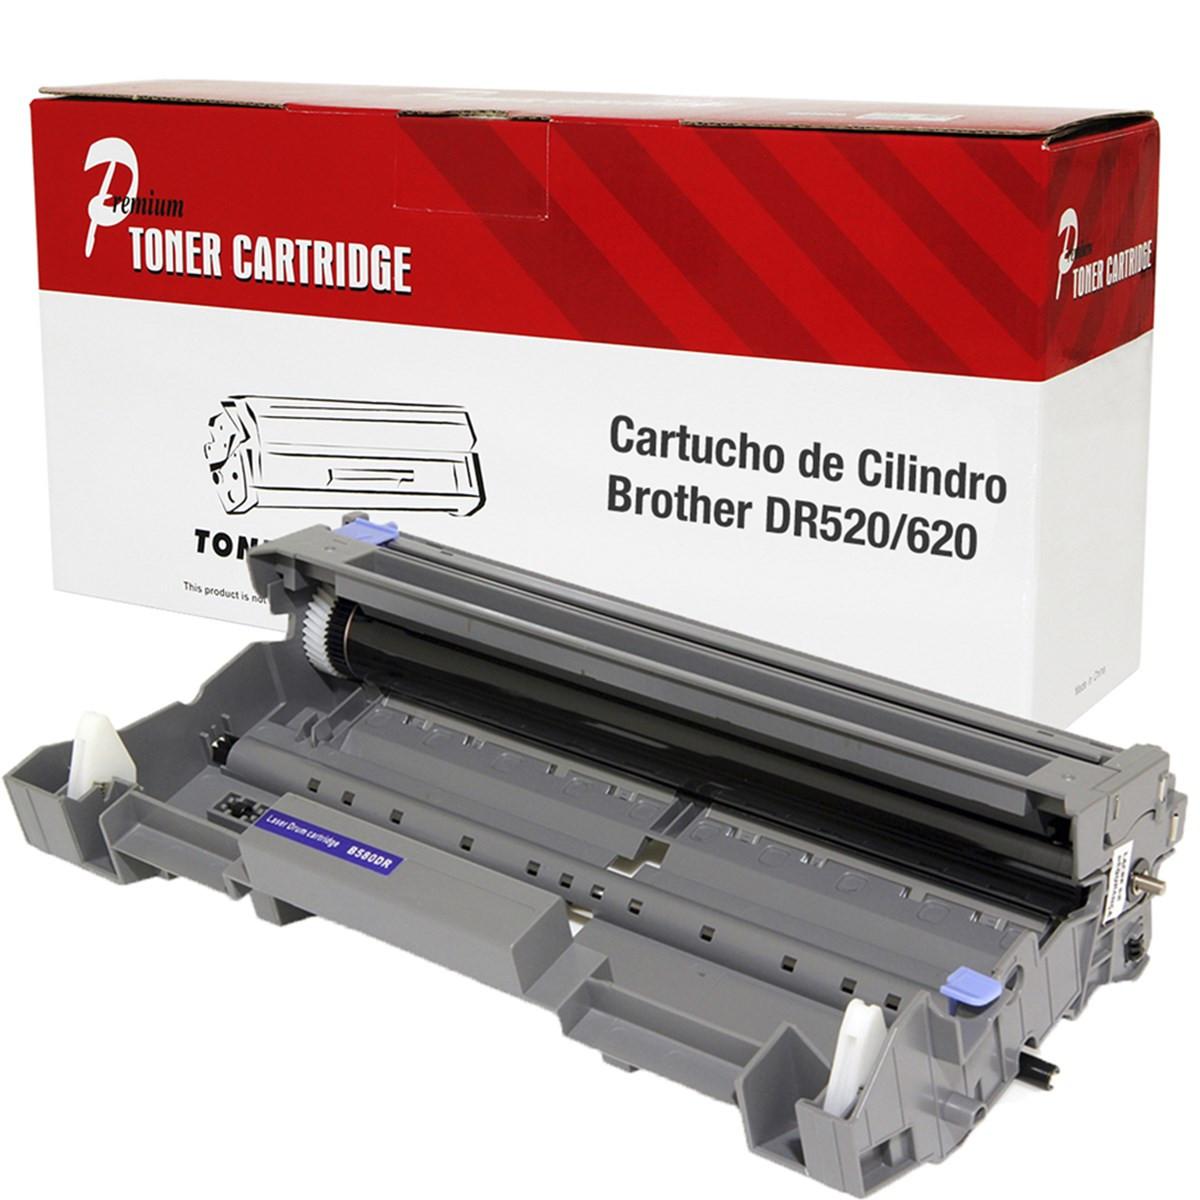 Cartucho de Cilindro Brother DR620 DR 620 para TN650 TN 650 | 8080 | 8085 Compatível Premium